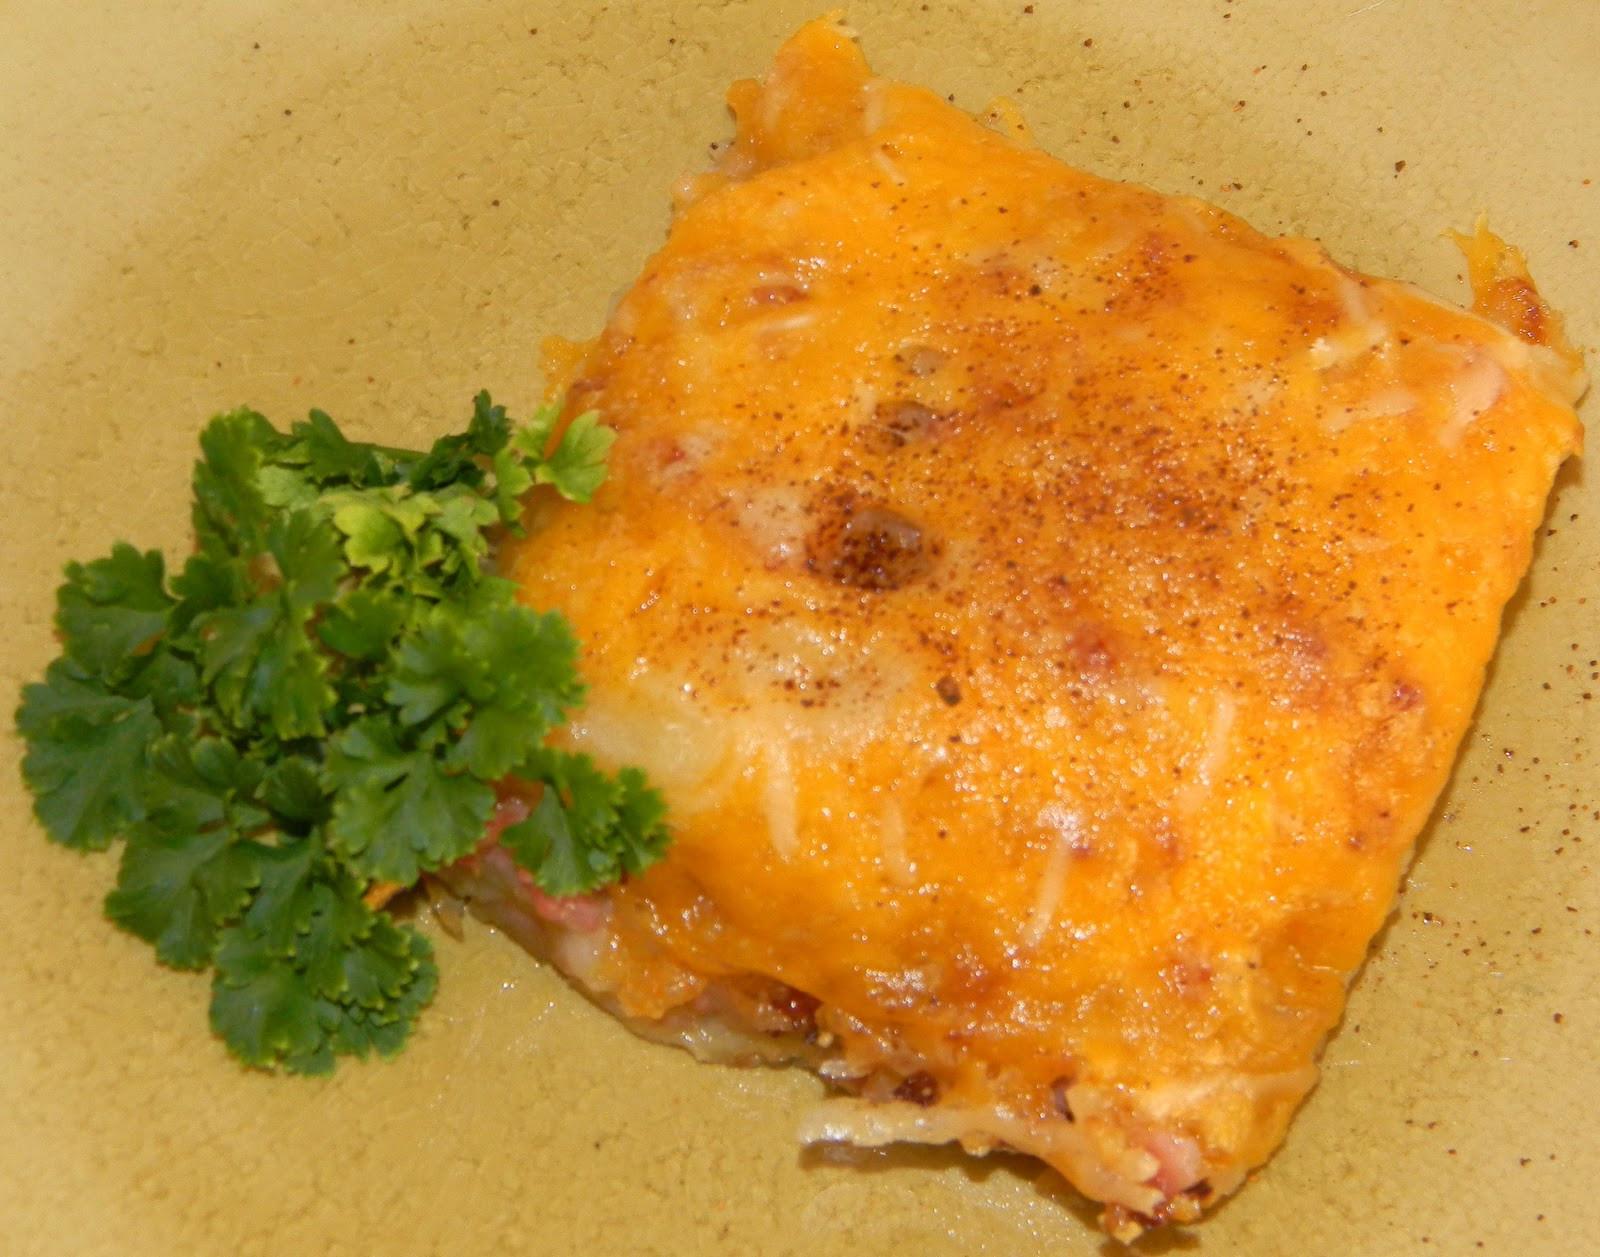 Shredded Potato Casserole  4 U Gluten Free Ham and Shredded Potato Casserole